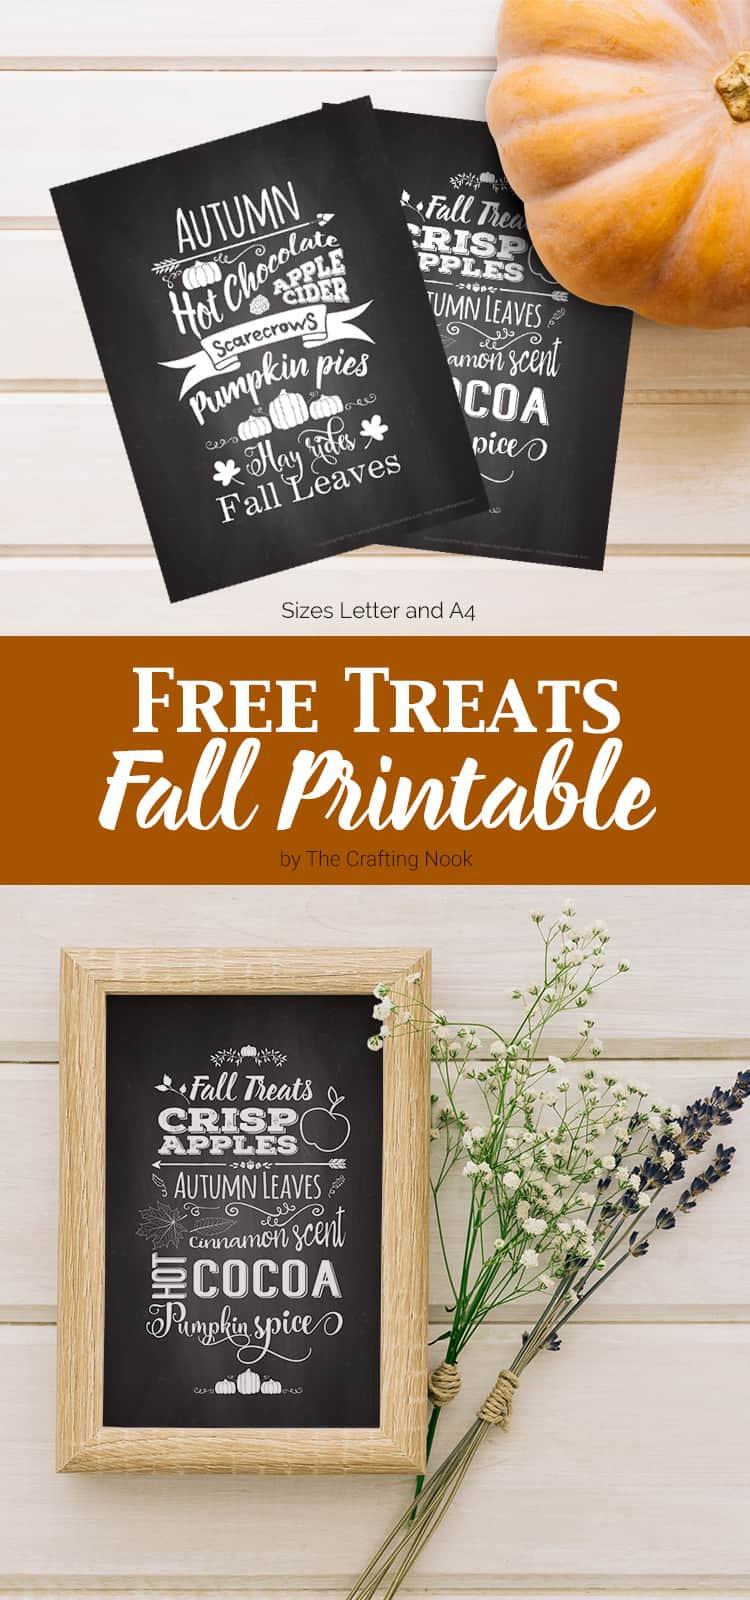 FREE Treats Fall Printable